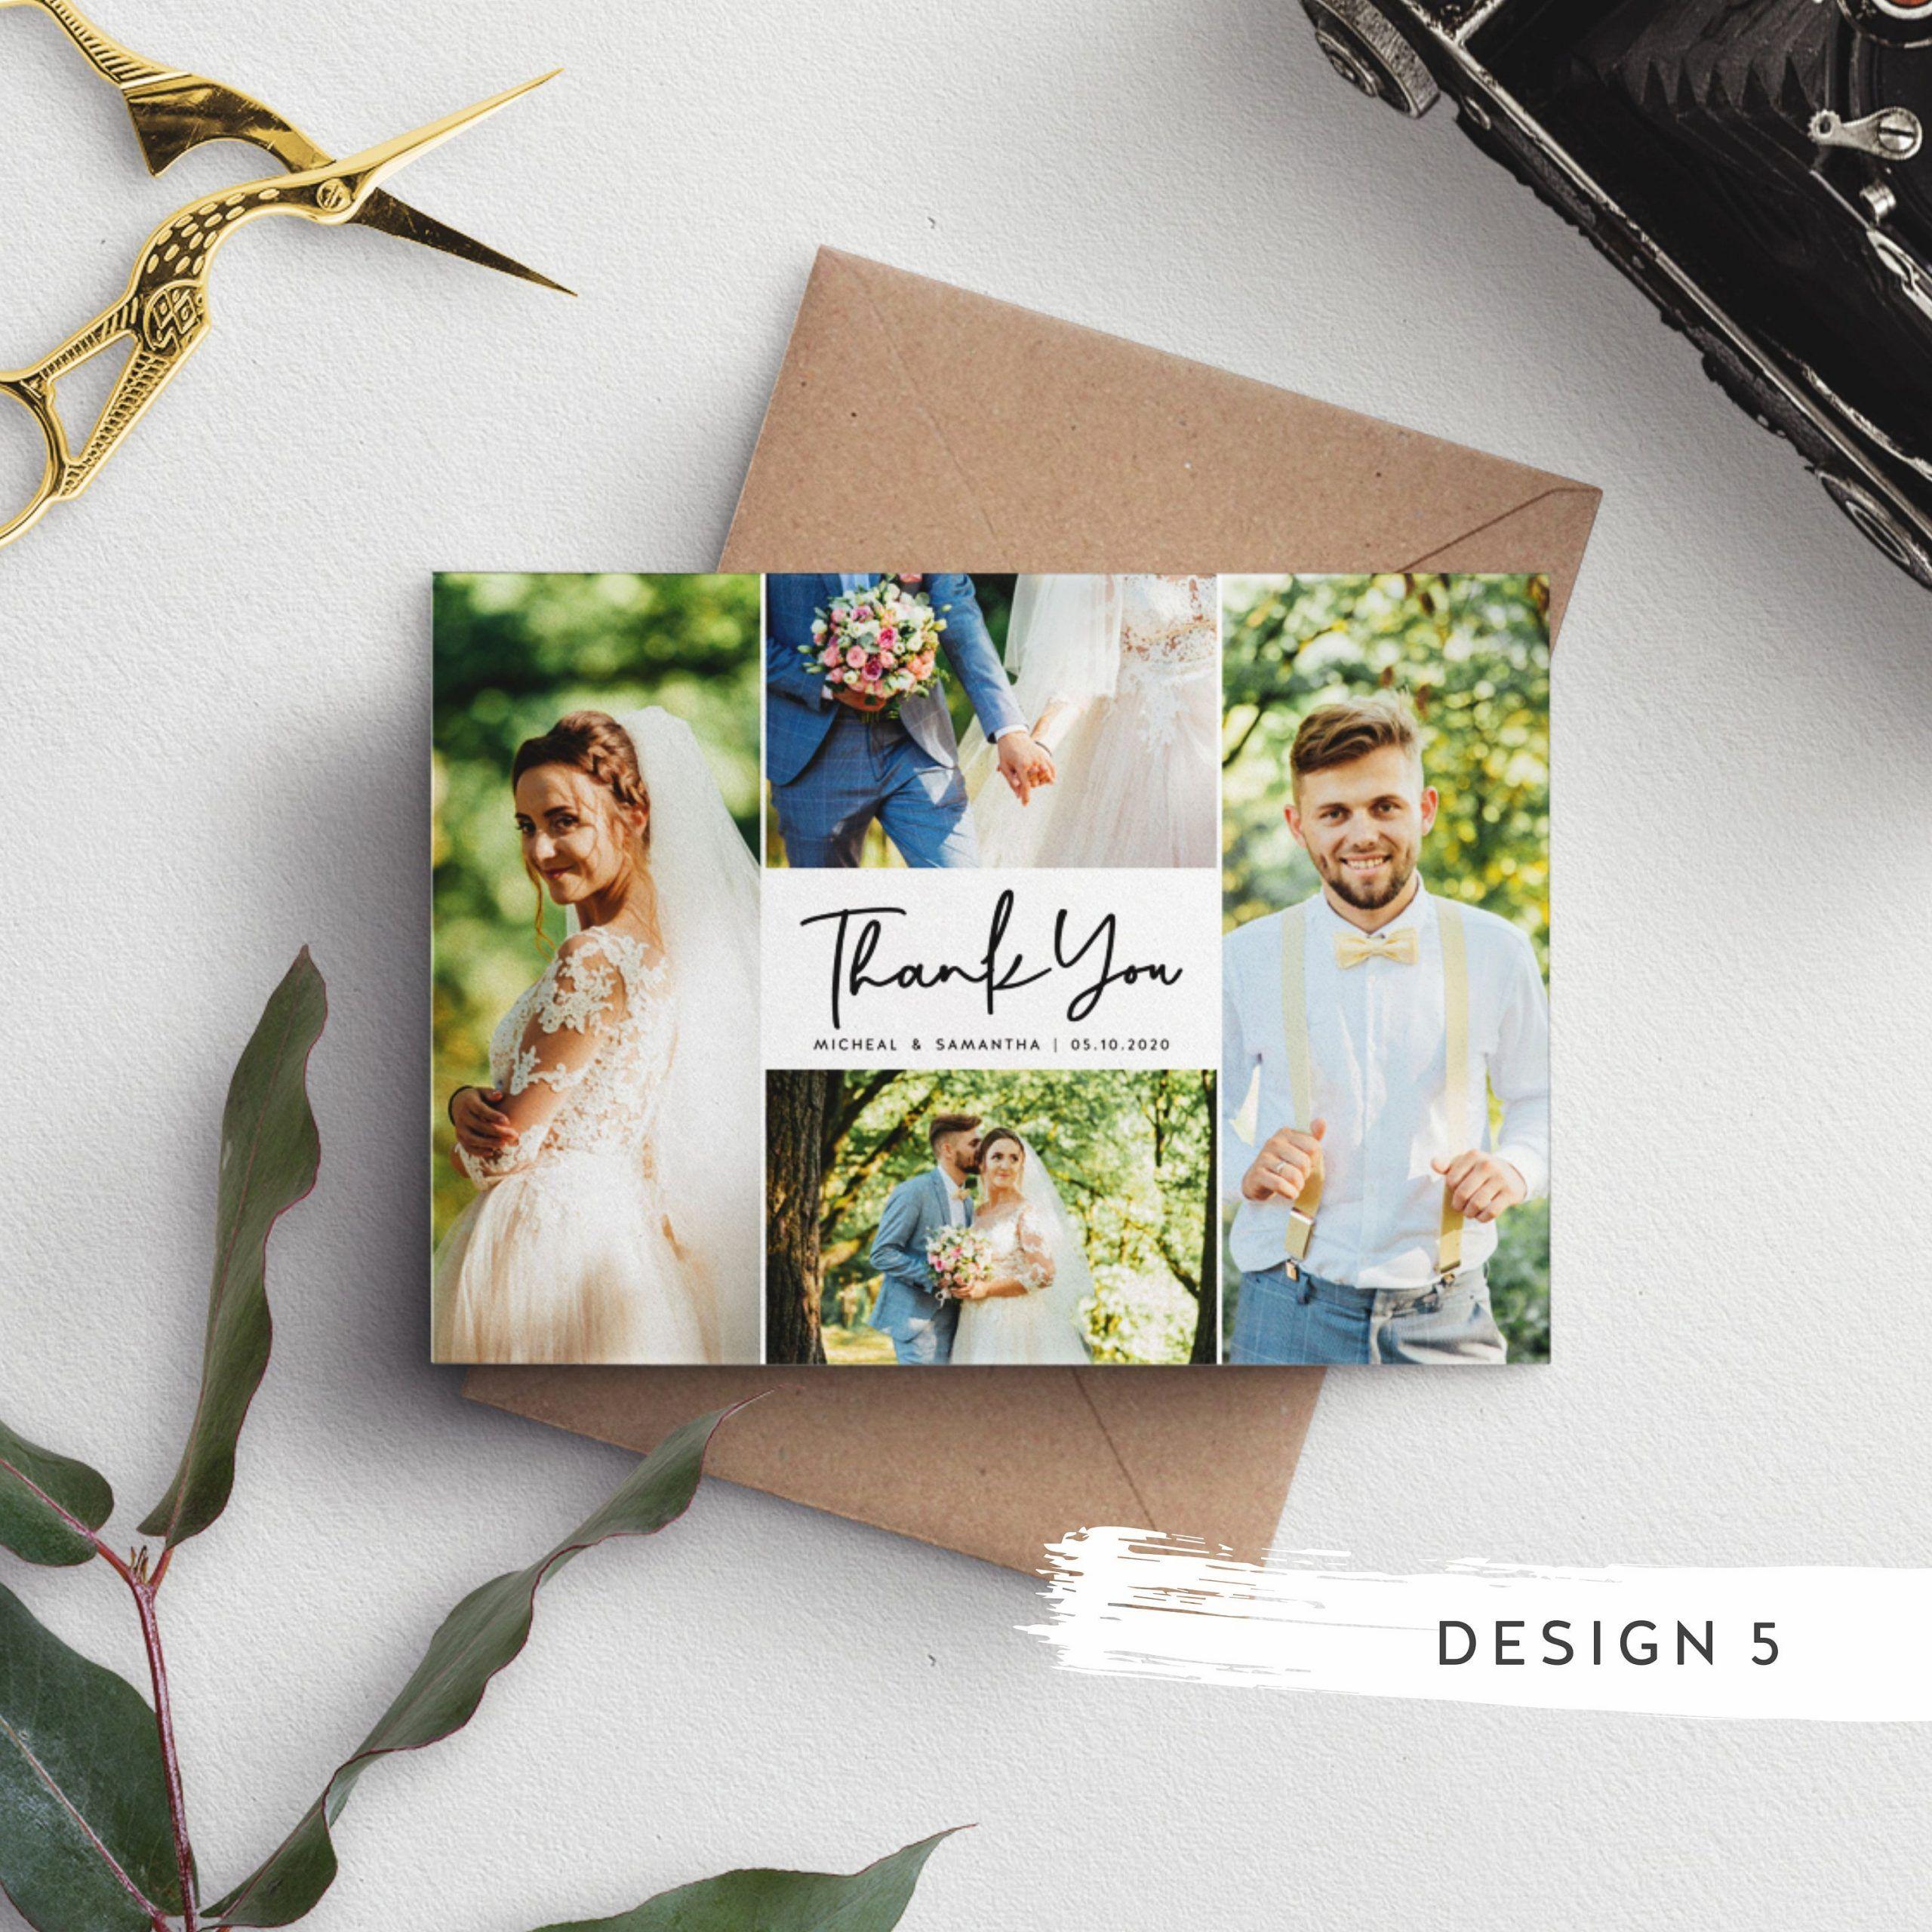 Wedding Thank You Cards, Wedding Thank You Cards With Photo, Thank You Cards, Thank You Wedding Card, Wedding Picture Card, Rustic #087#card #cards #photo #picture #rustic #wedding